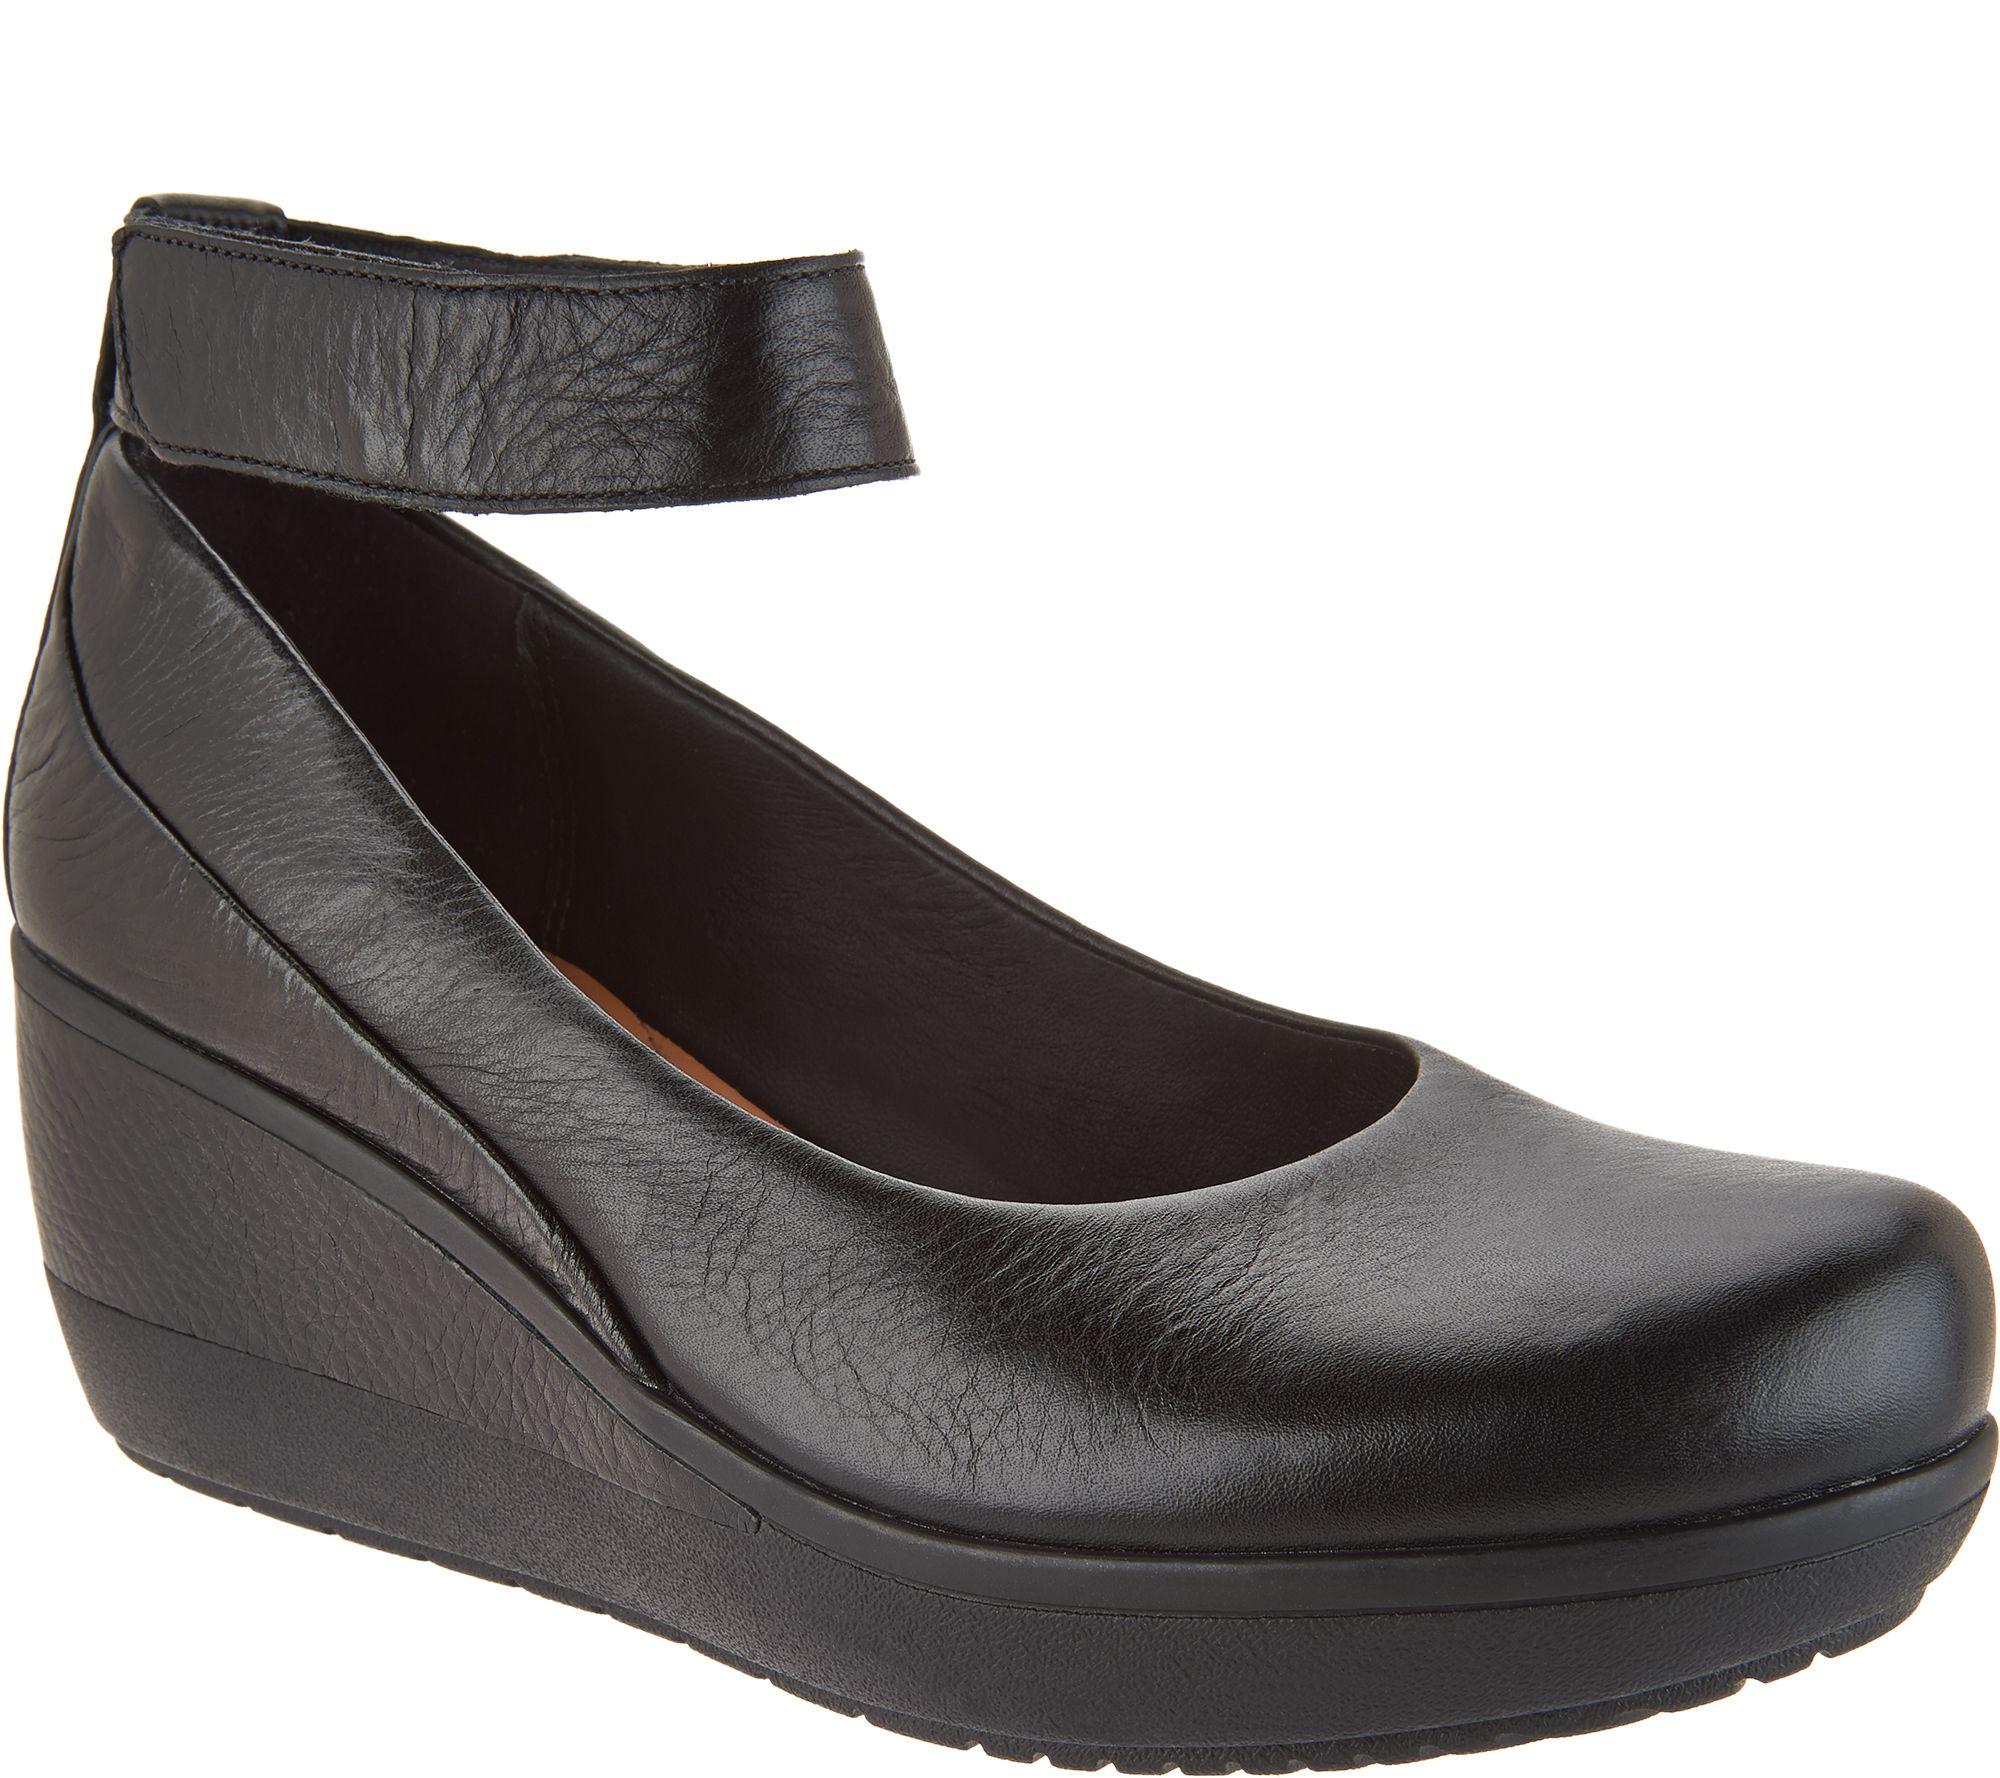 2711edd19d4a Clarks Artisan Leather Wedges w  Ankle Strap -Wynnmere Fox - Page 1 —  QVC.com